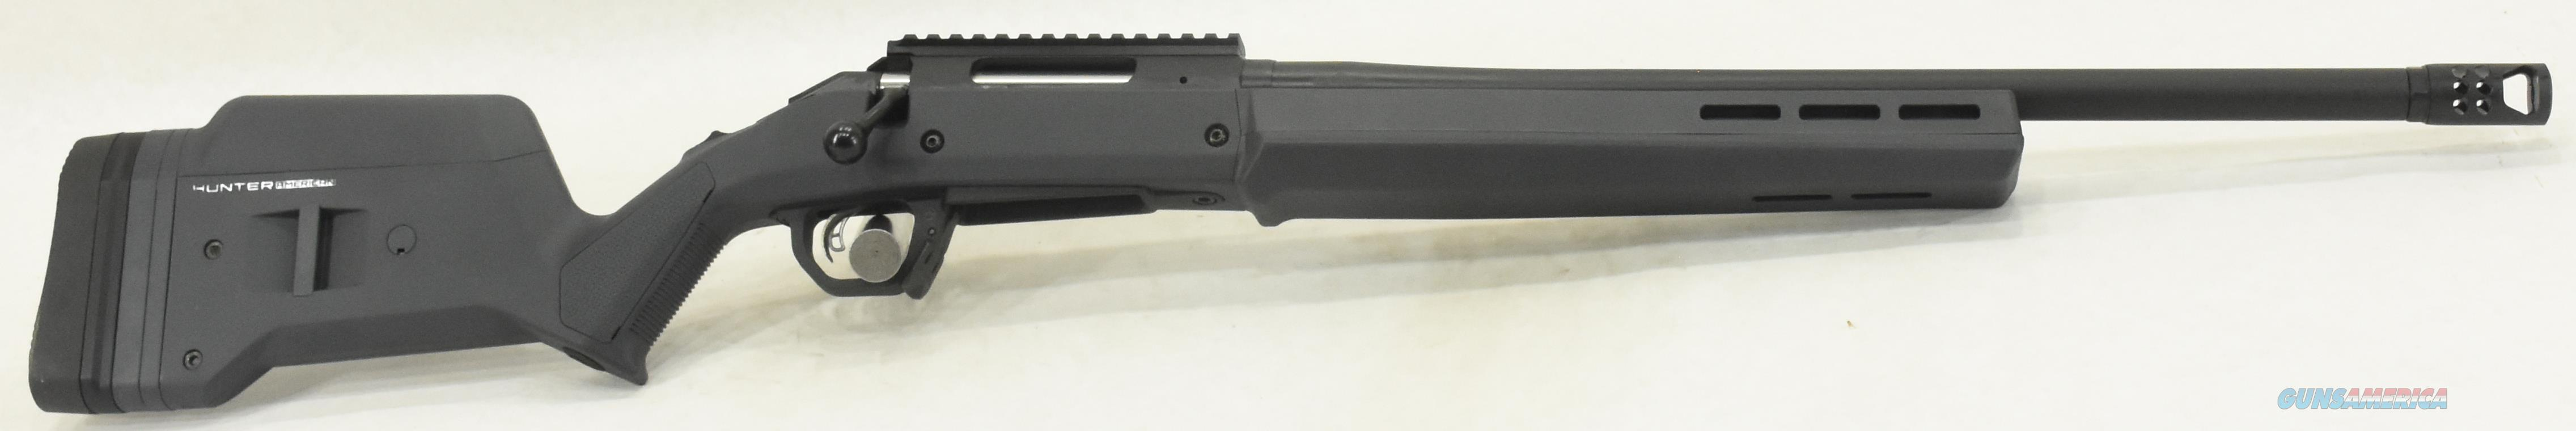 American Hunter 6.5CM 20In HB  26983  Guns > Rifles > Ruger Rifles > American Rifle